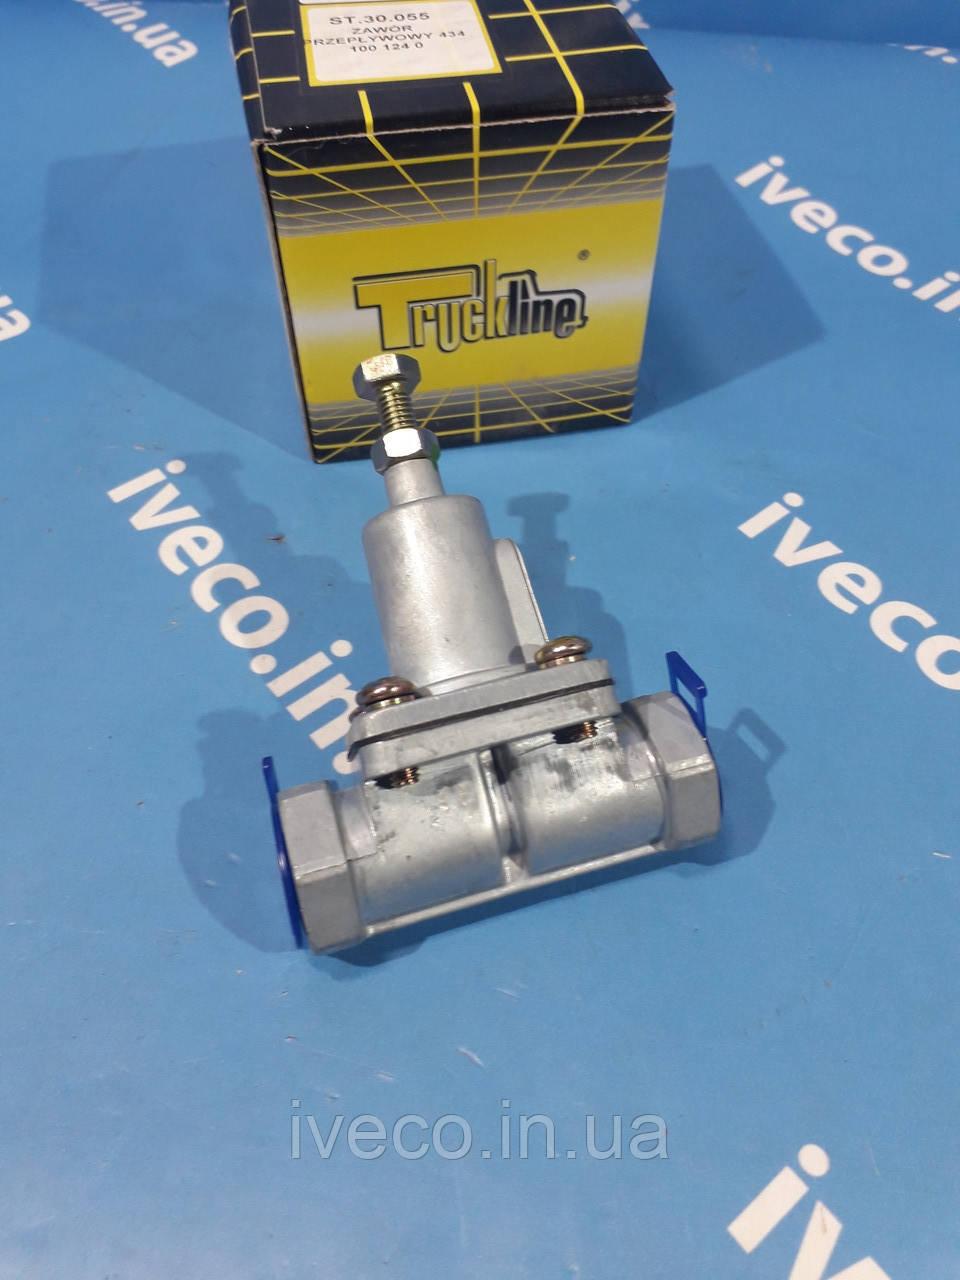 Перепускной клапан без обратного тока 5,5 бар IVECO MB RVI VOLVO 500005828 1505992 4341001240 1134344 ST30055